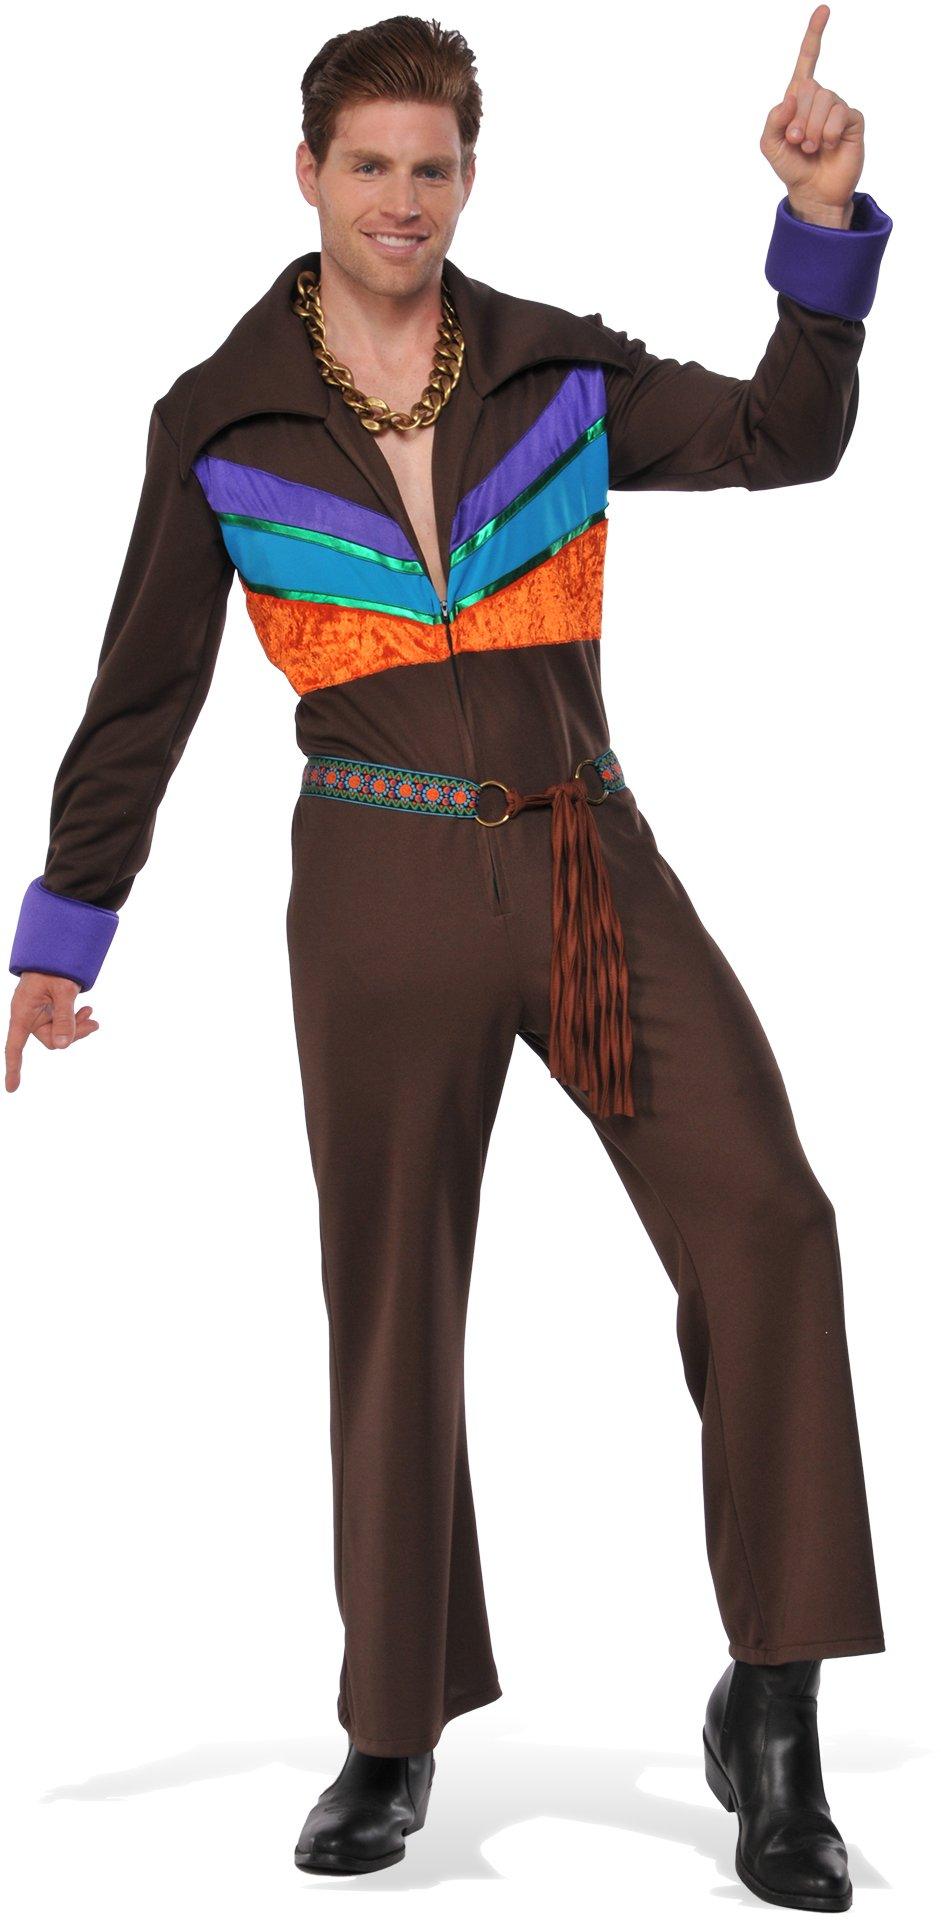 Rubie's Men's That 70's Guy Costume, As Shown, Standard